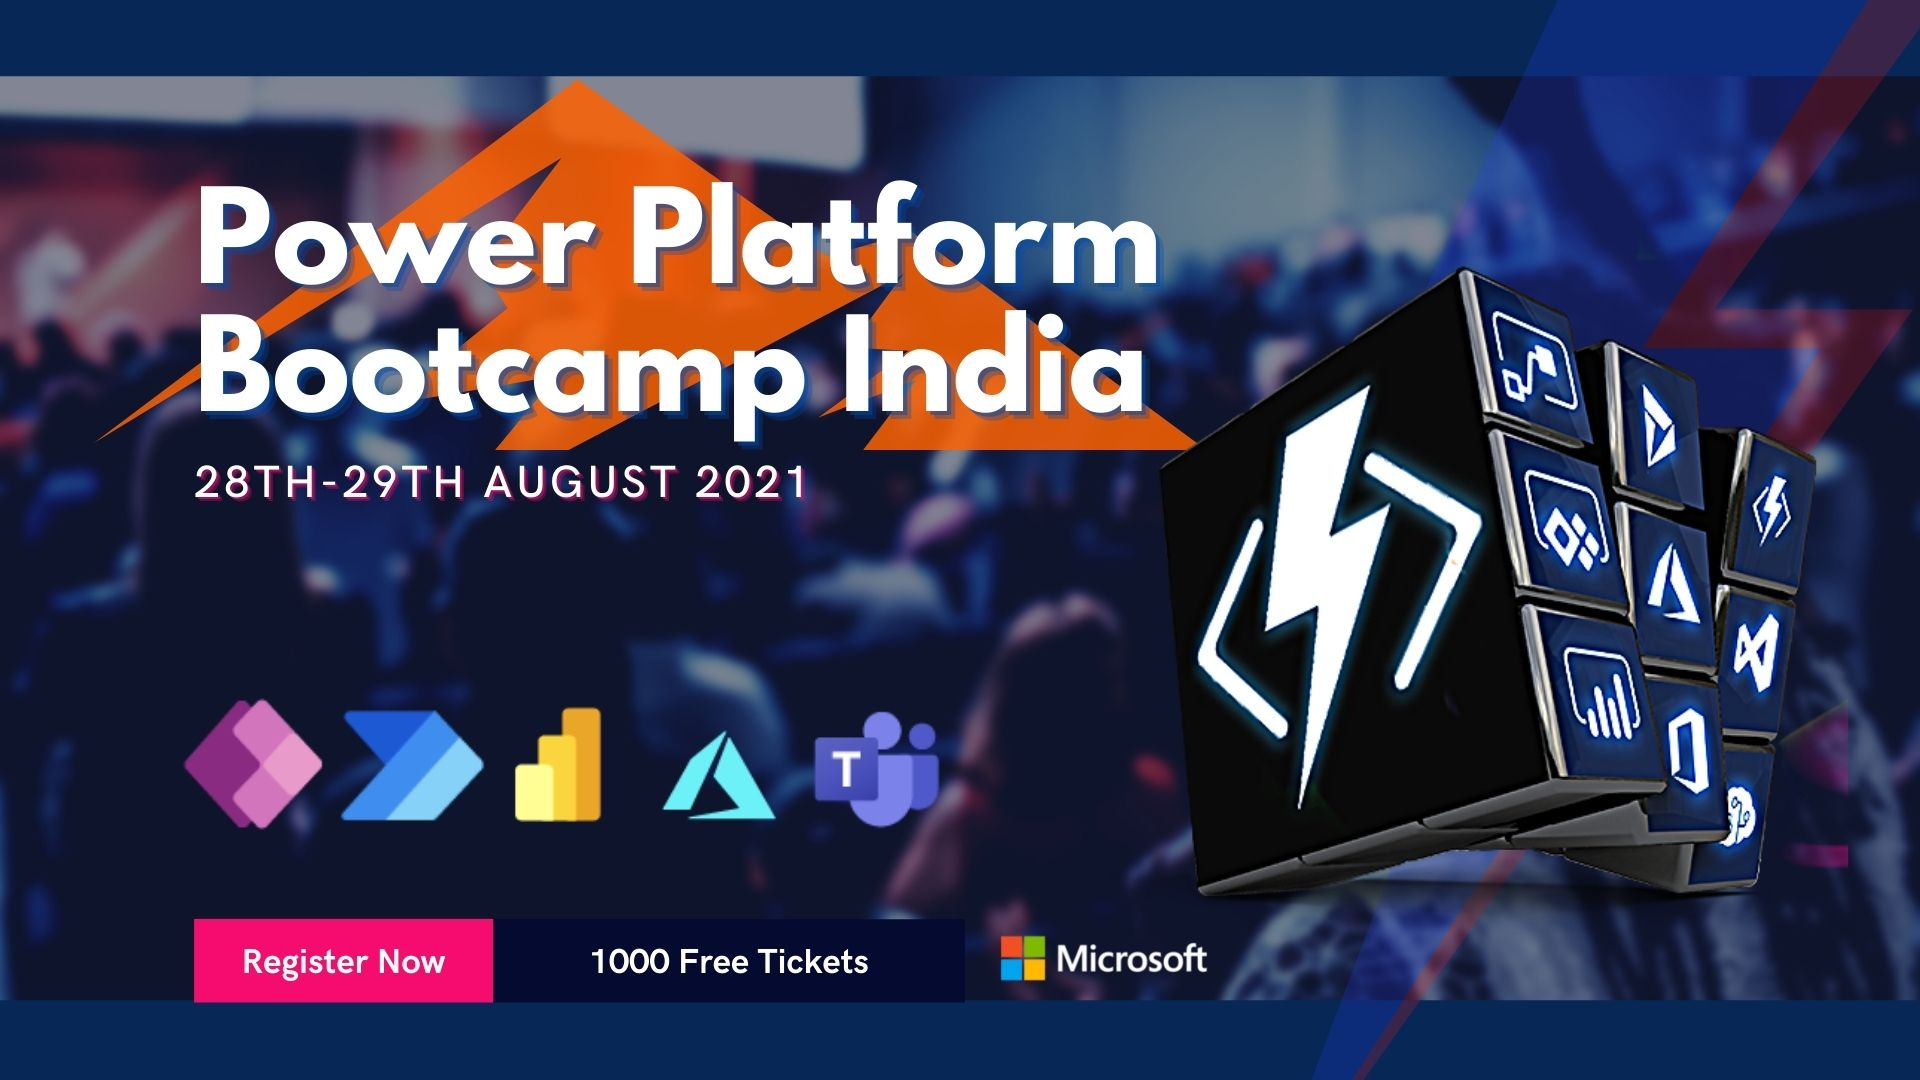 Power Platform Bootcamp India